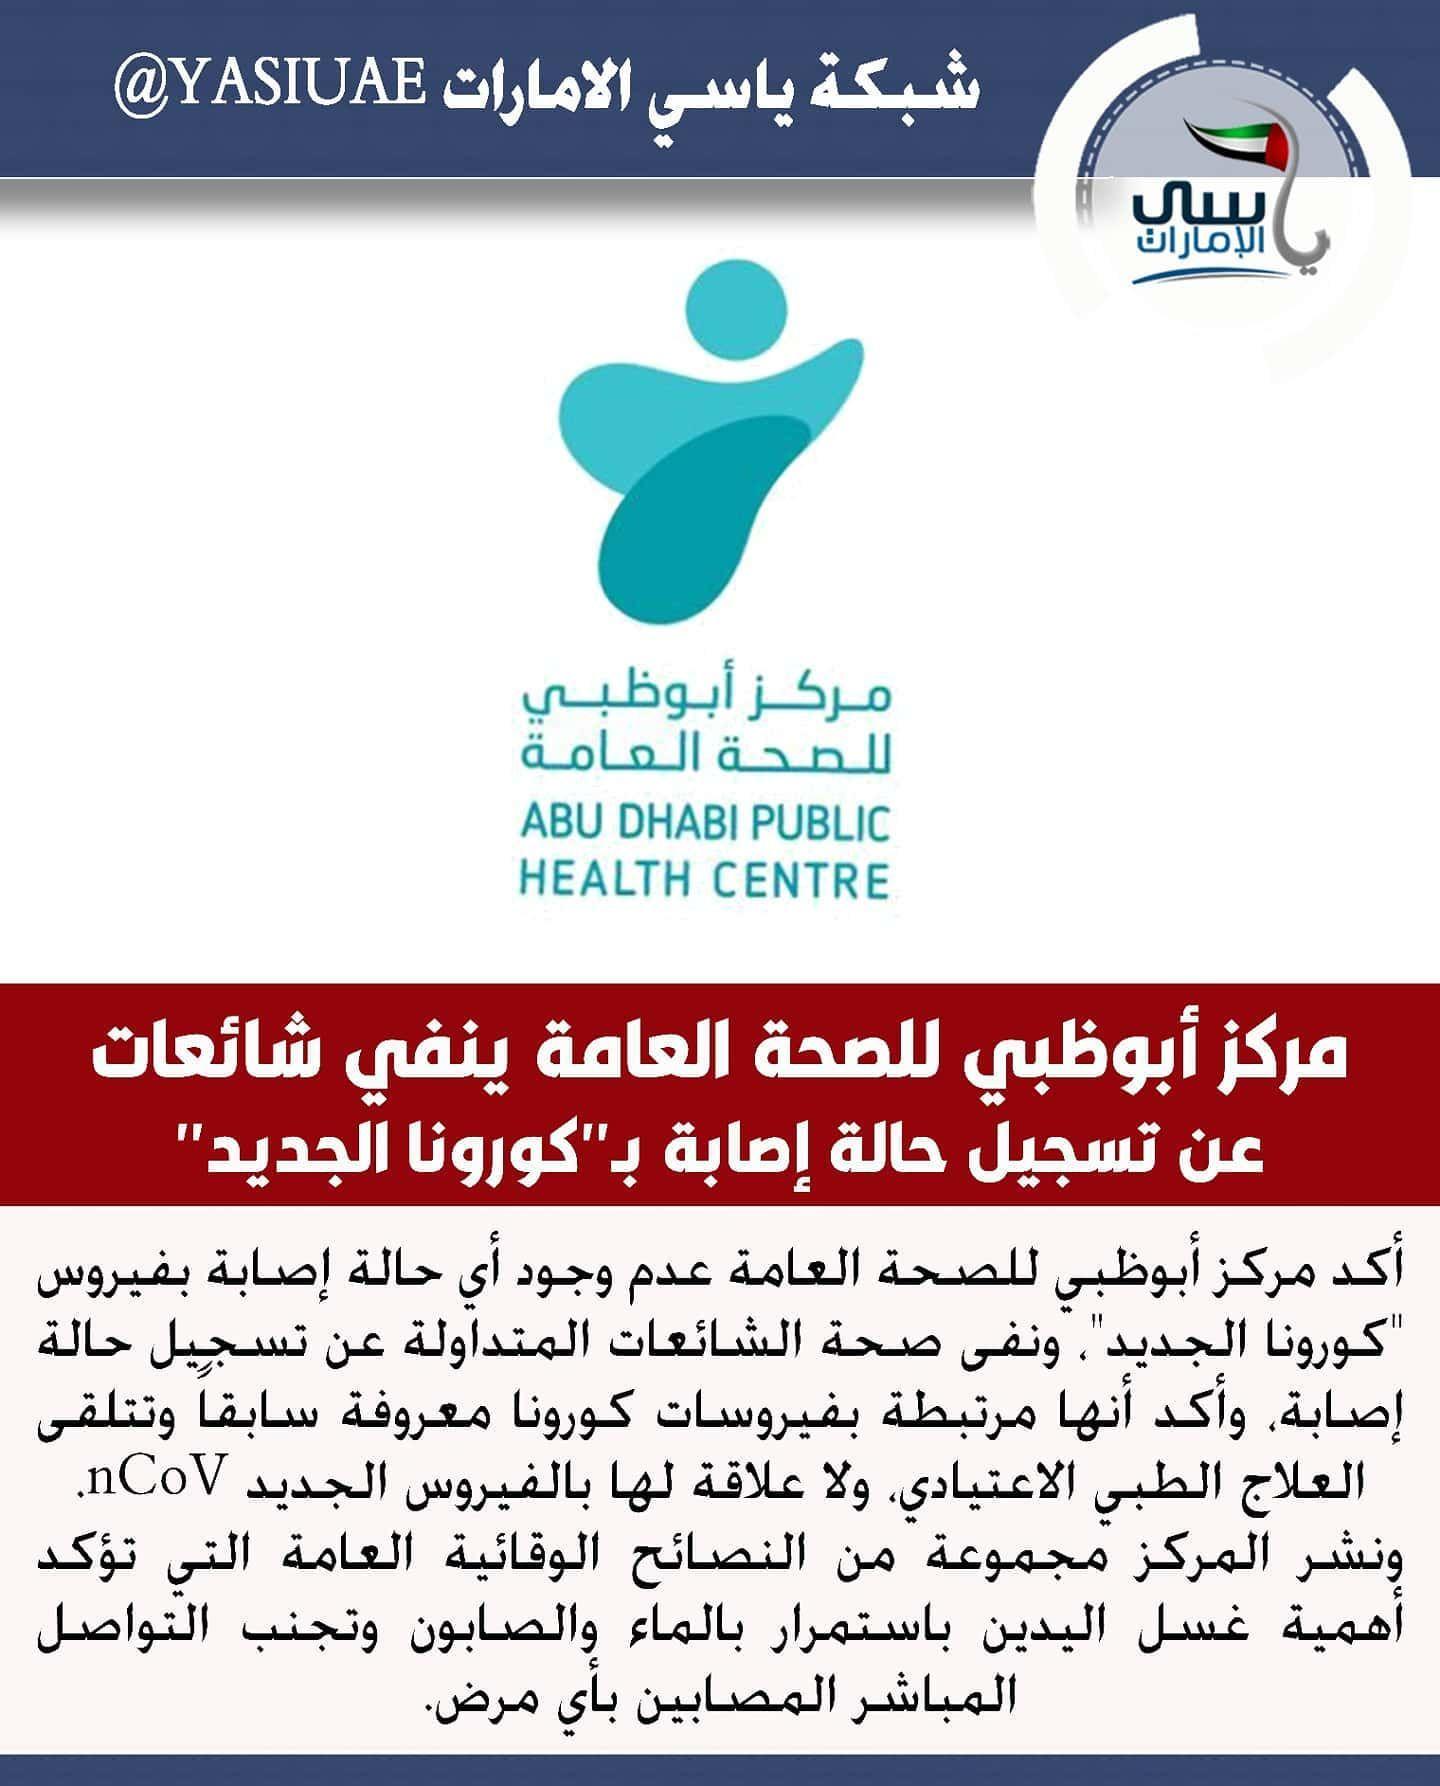 Coronoavirus مركز أبوظبي للصحة العامة ينفي شائعات عن تسجيل حالة إصابة بـ كورونا الجديد كورونا فيروس كورونا ياسي الامارات Public Health Health Abu Dhabi